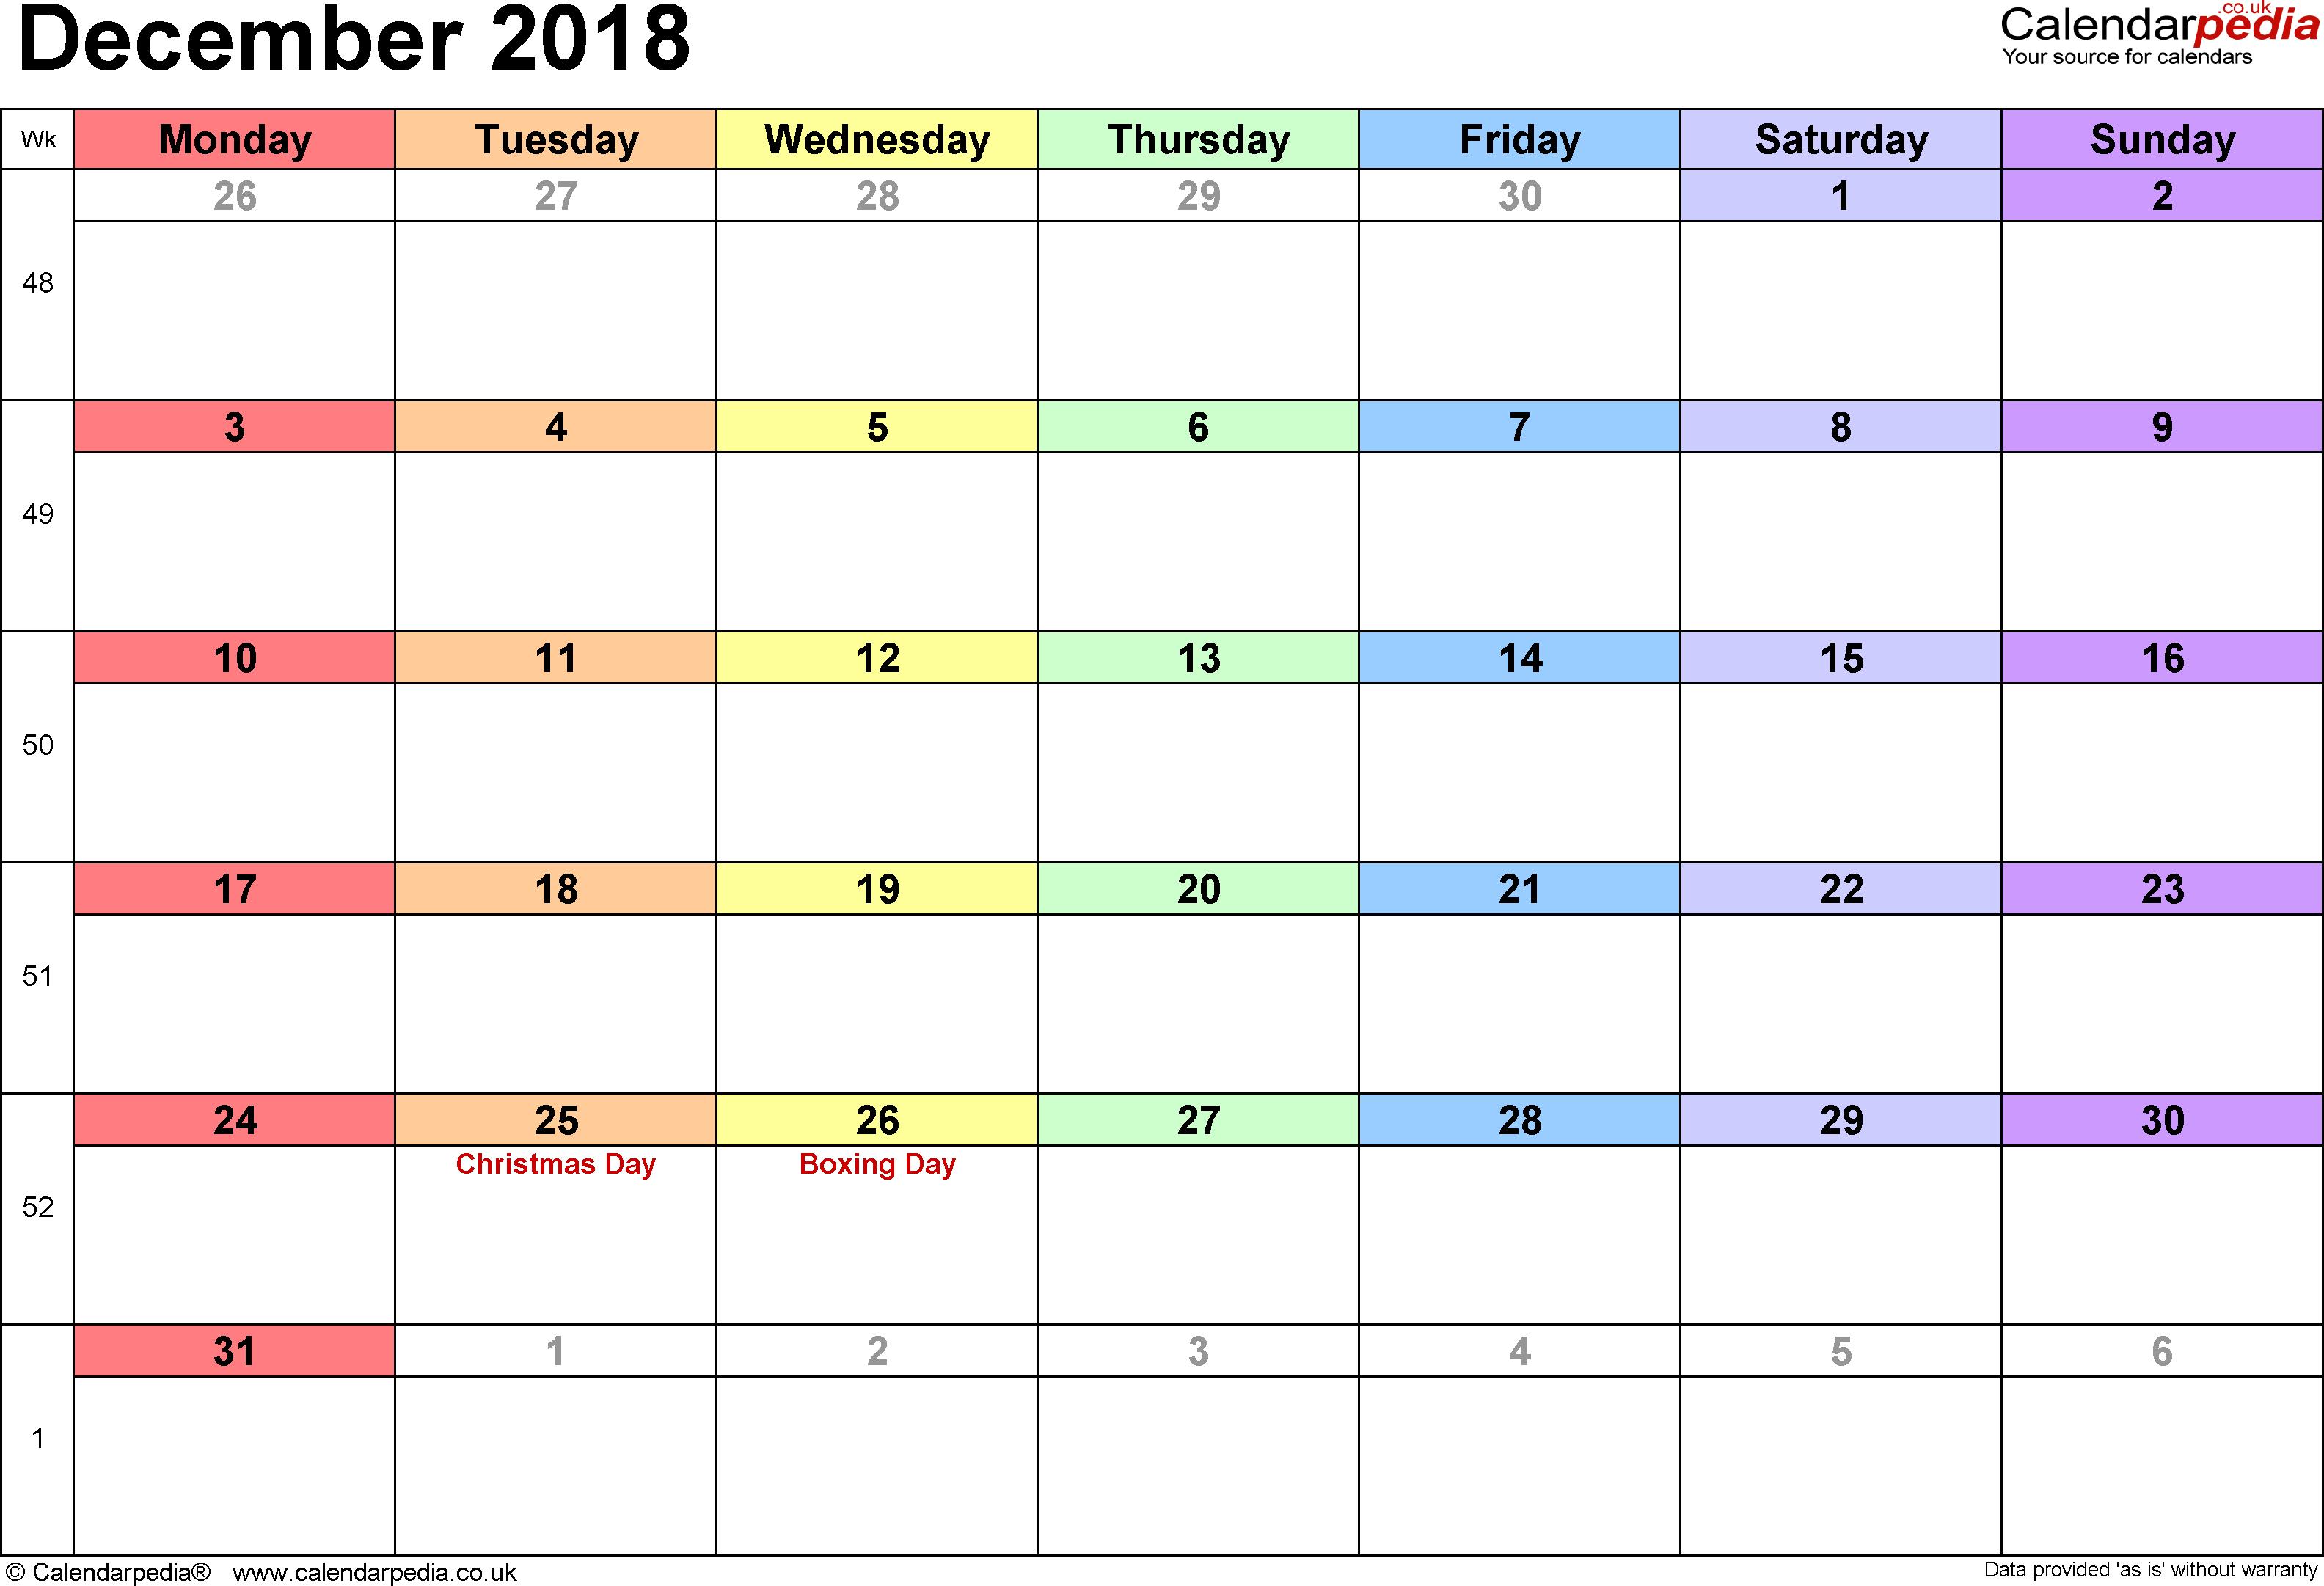 Calendar Spreadsheet 2018 Inside Calendar December 2018 Uk, Bank Holidays, Excel/pdf/word Templates